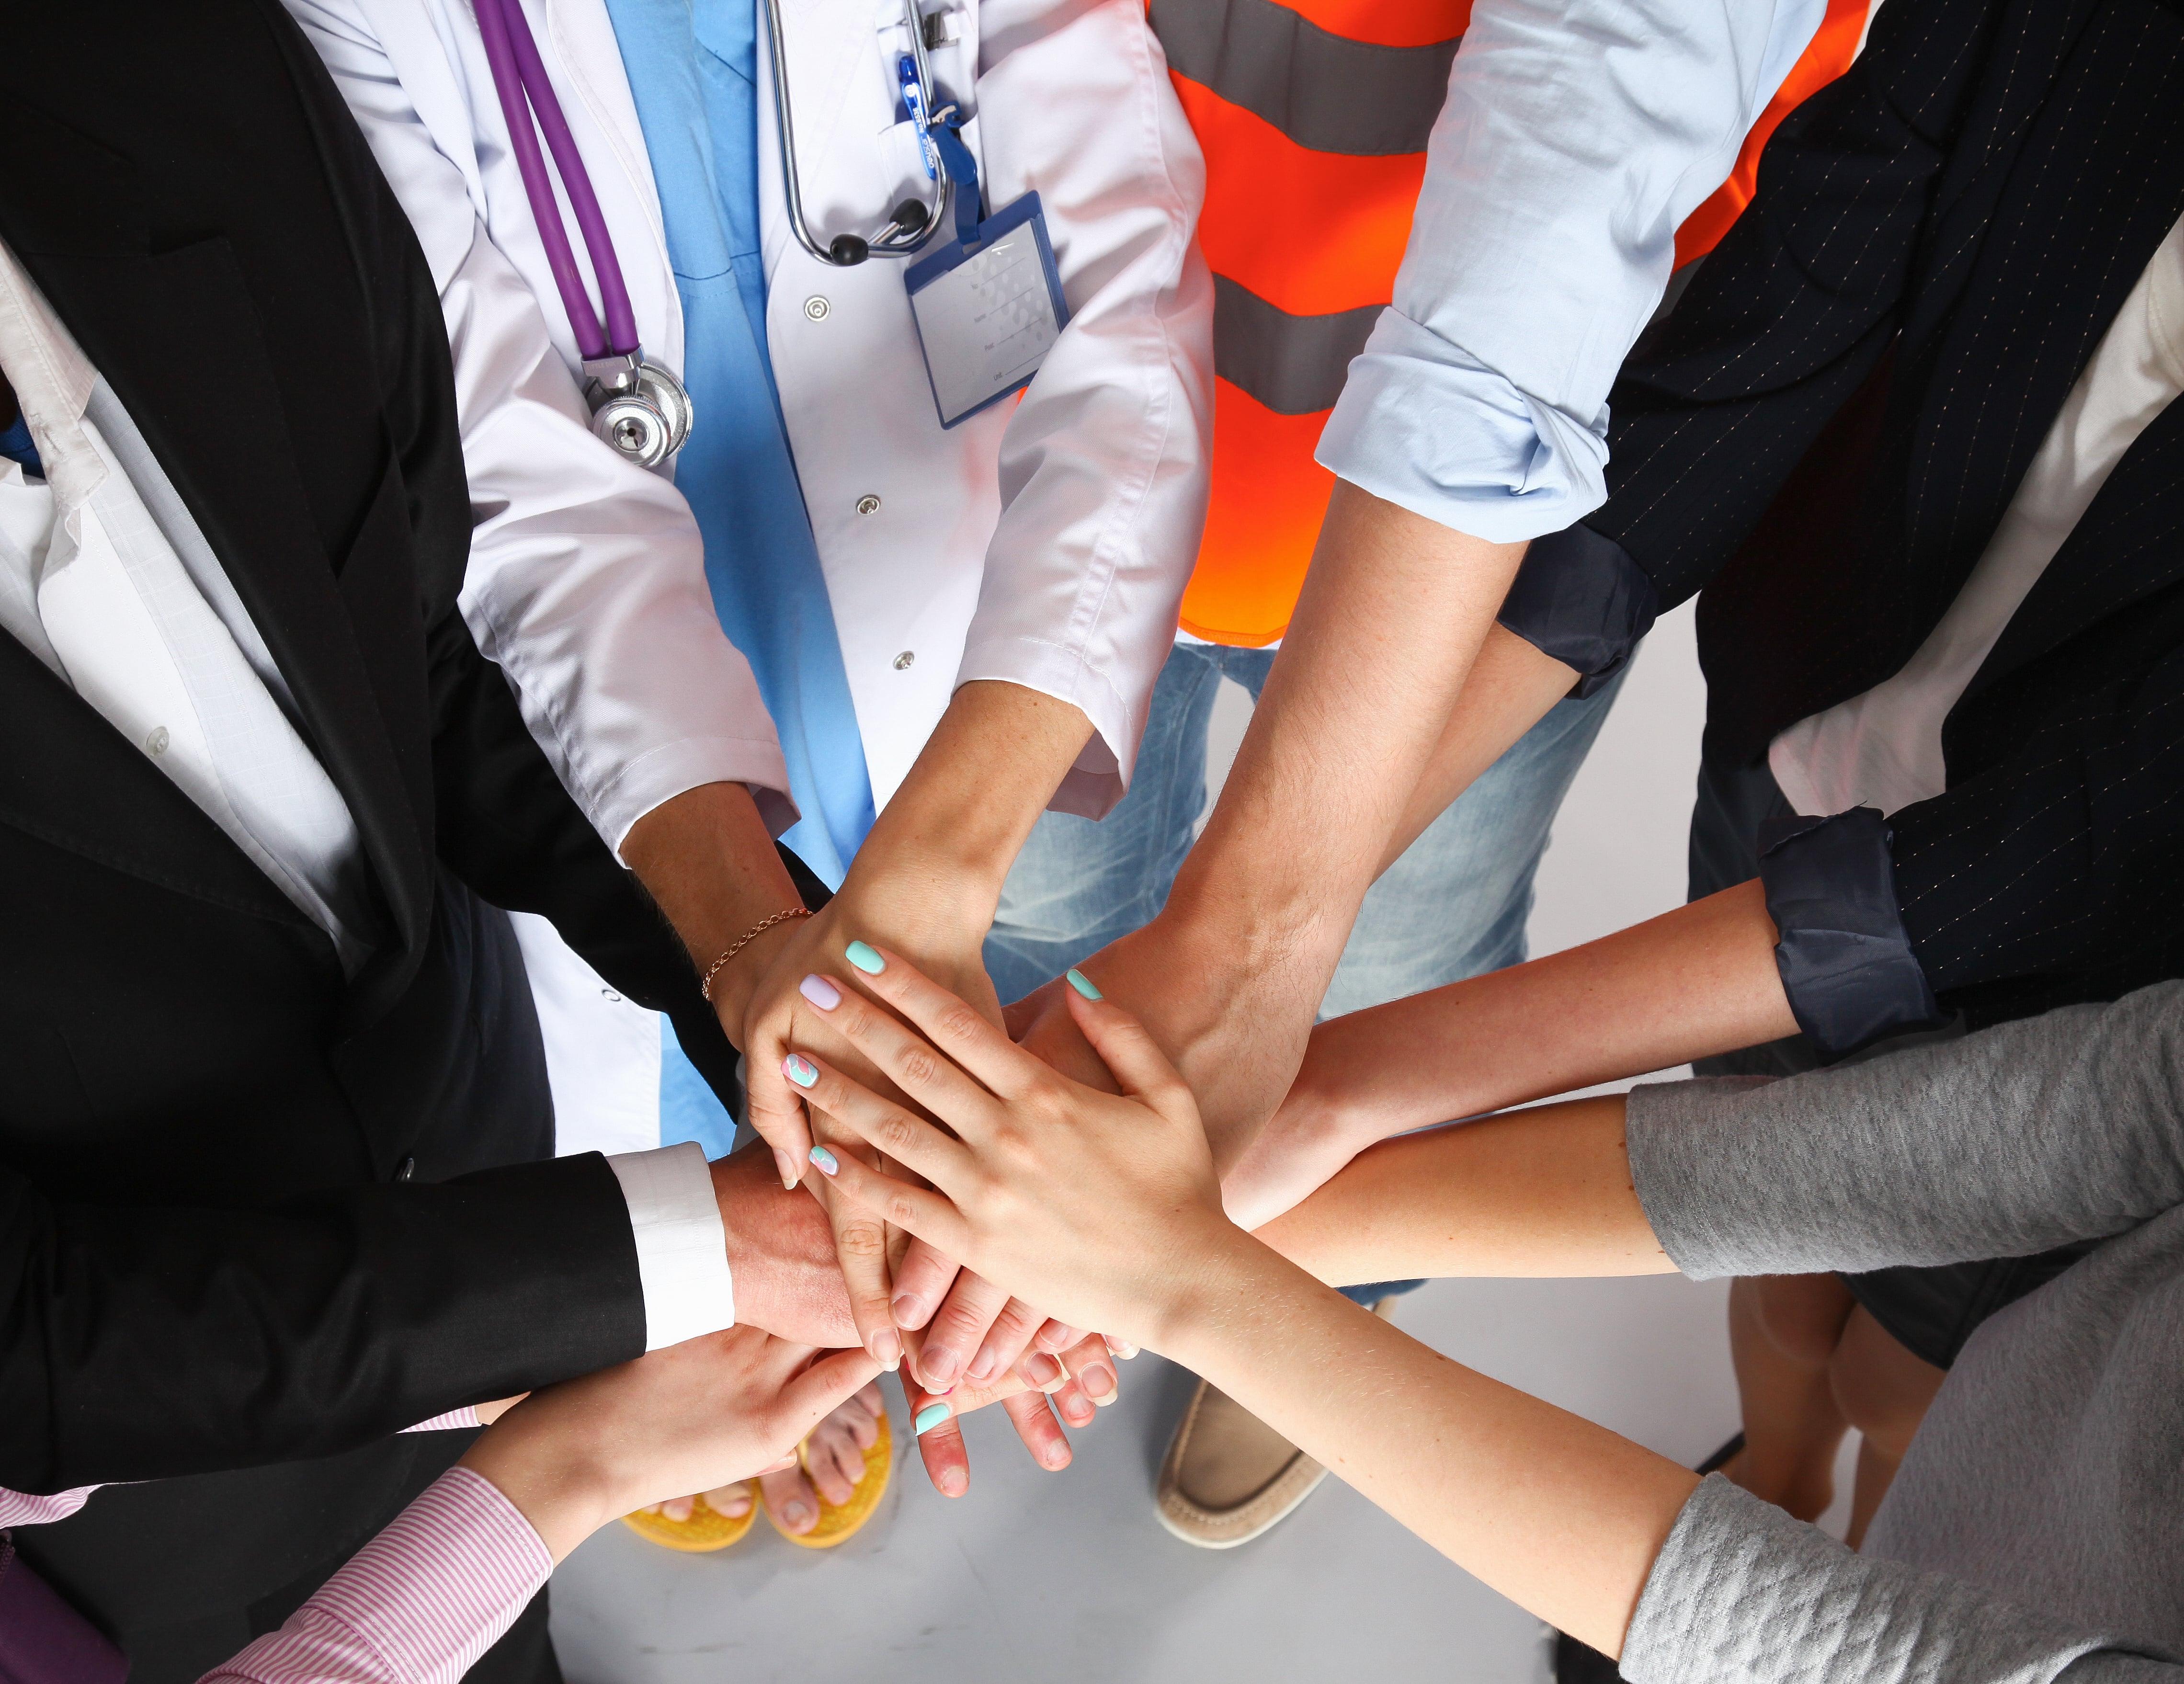 Choosing a Medical Provider